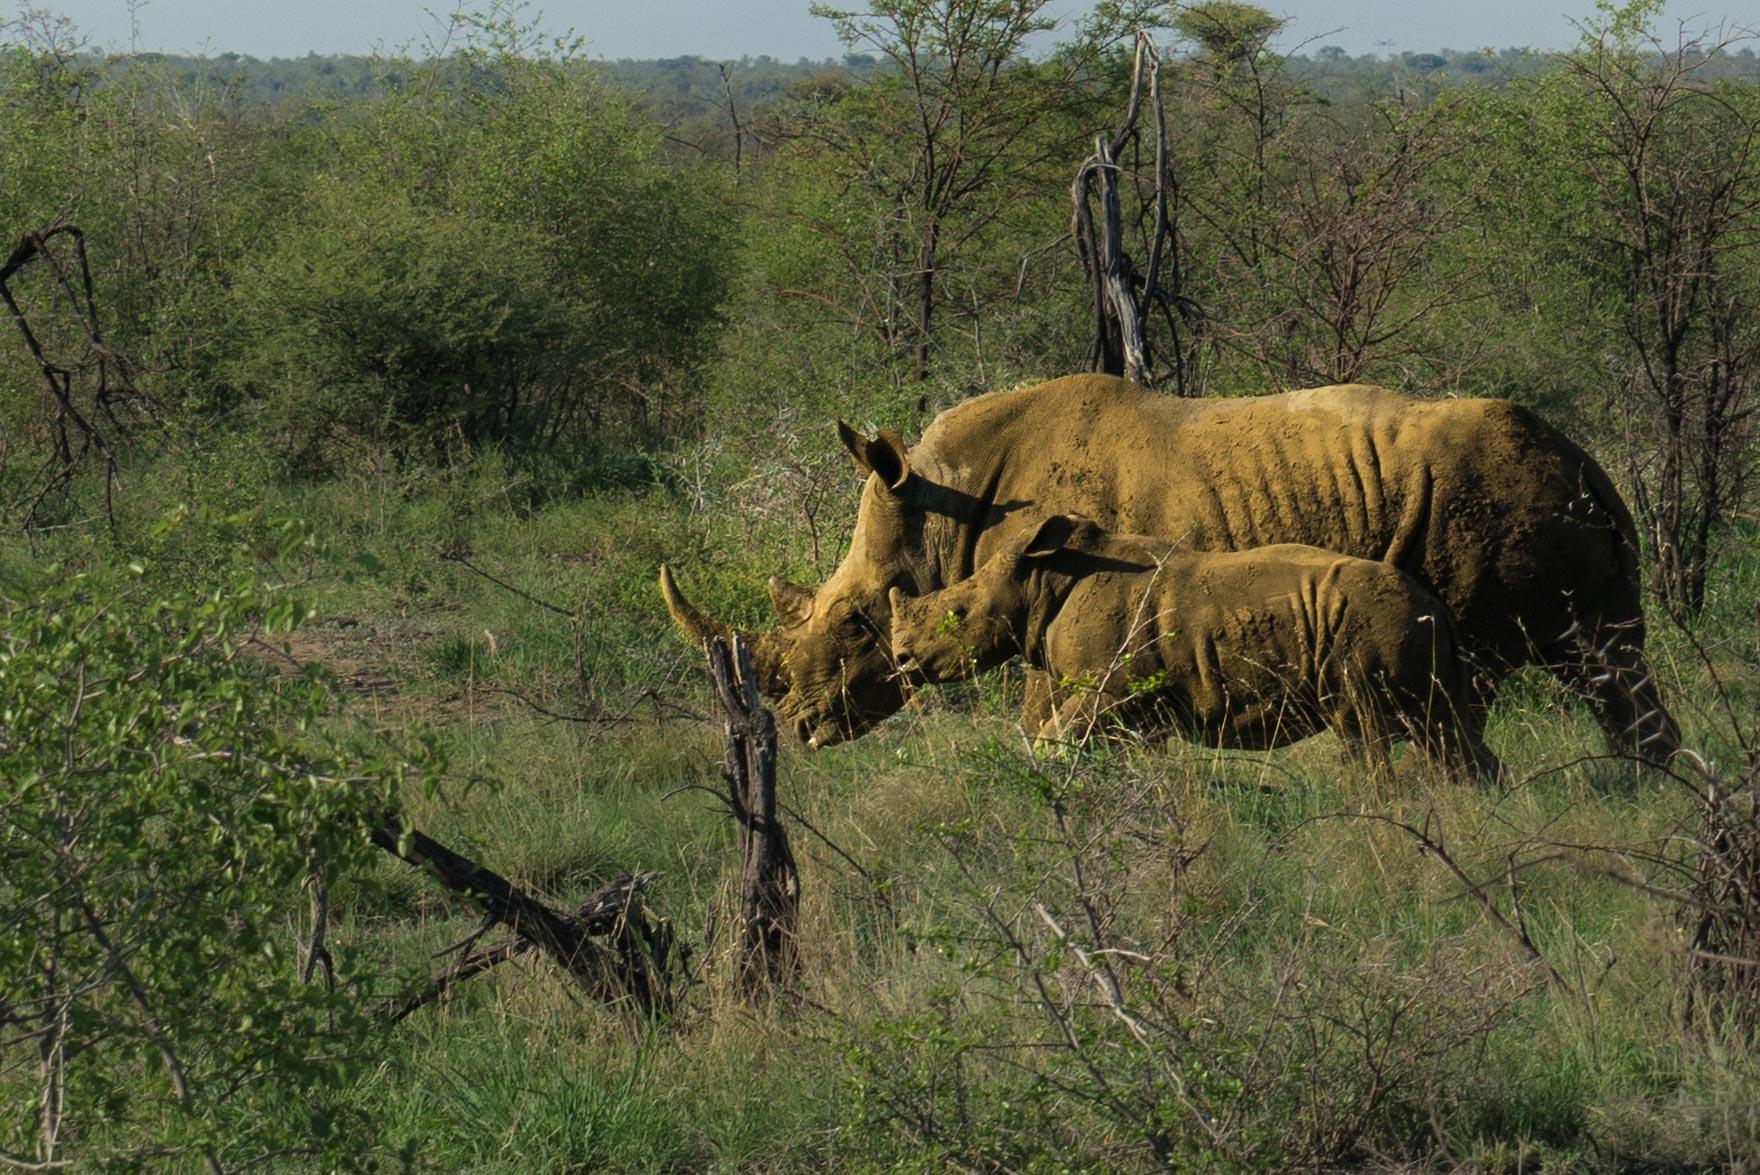 south africa madikwe safari pescart rhino mother and cub